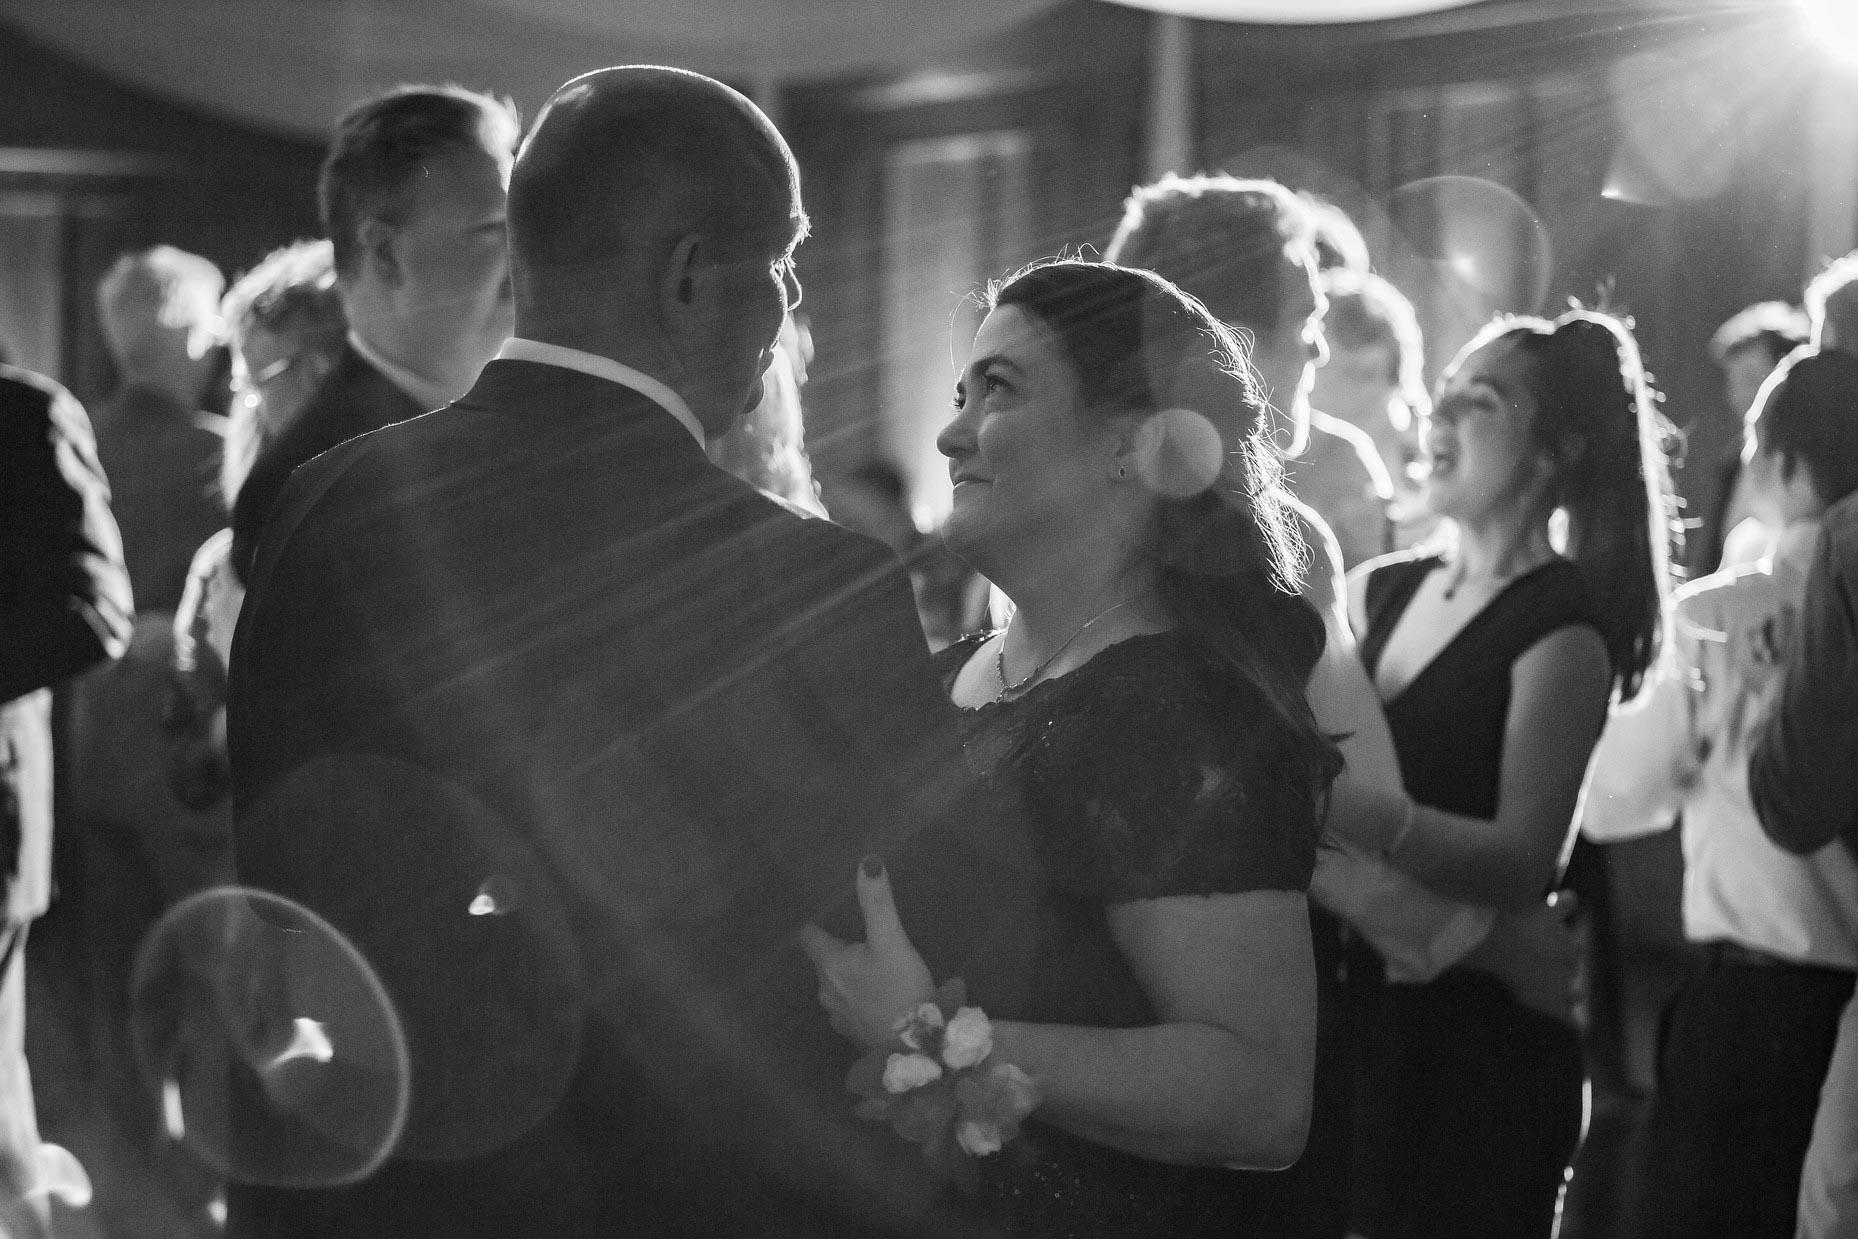 adam-szarmack-bowing-oaks-wedding-photographer-jacksonville-132.jpg